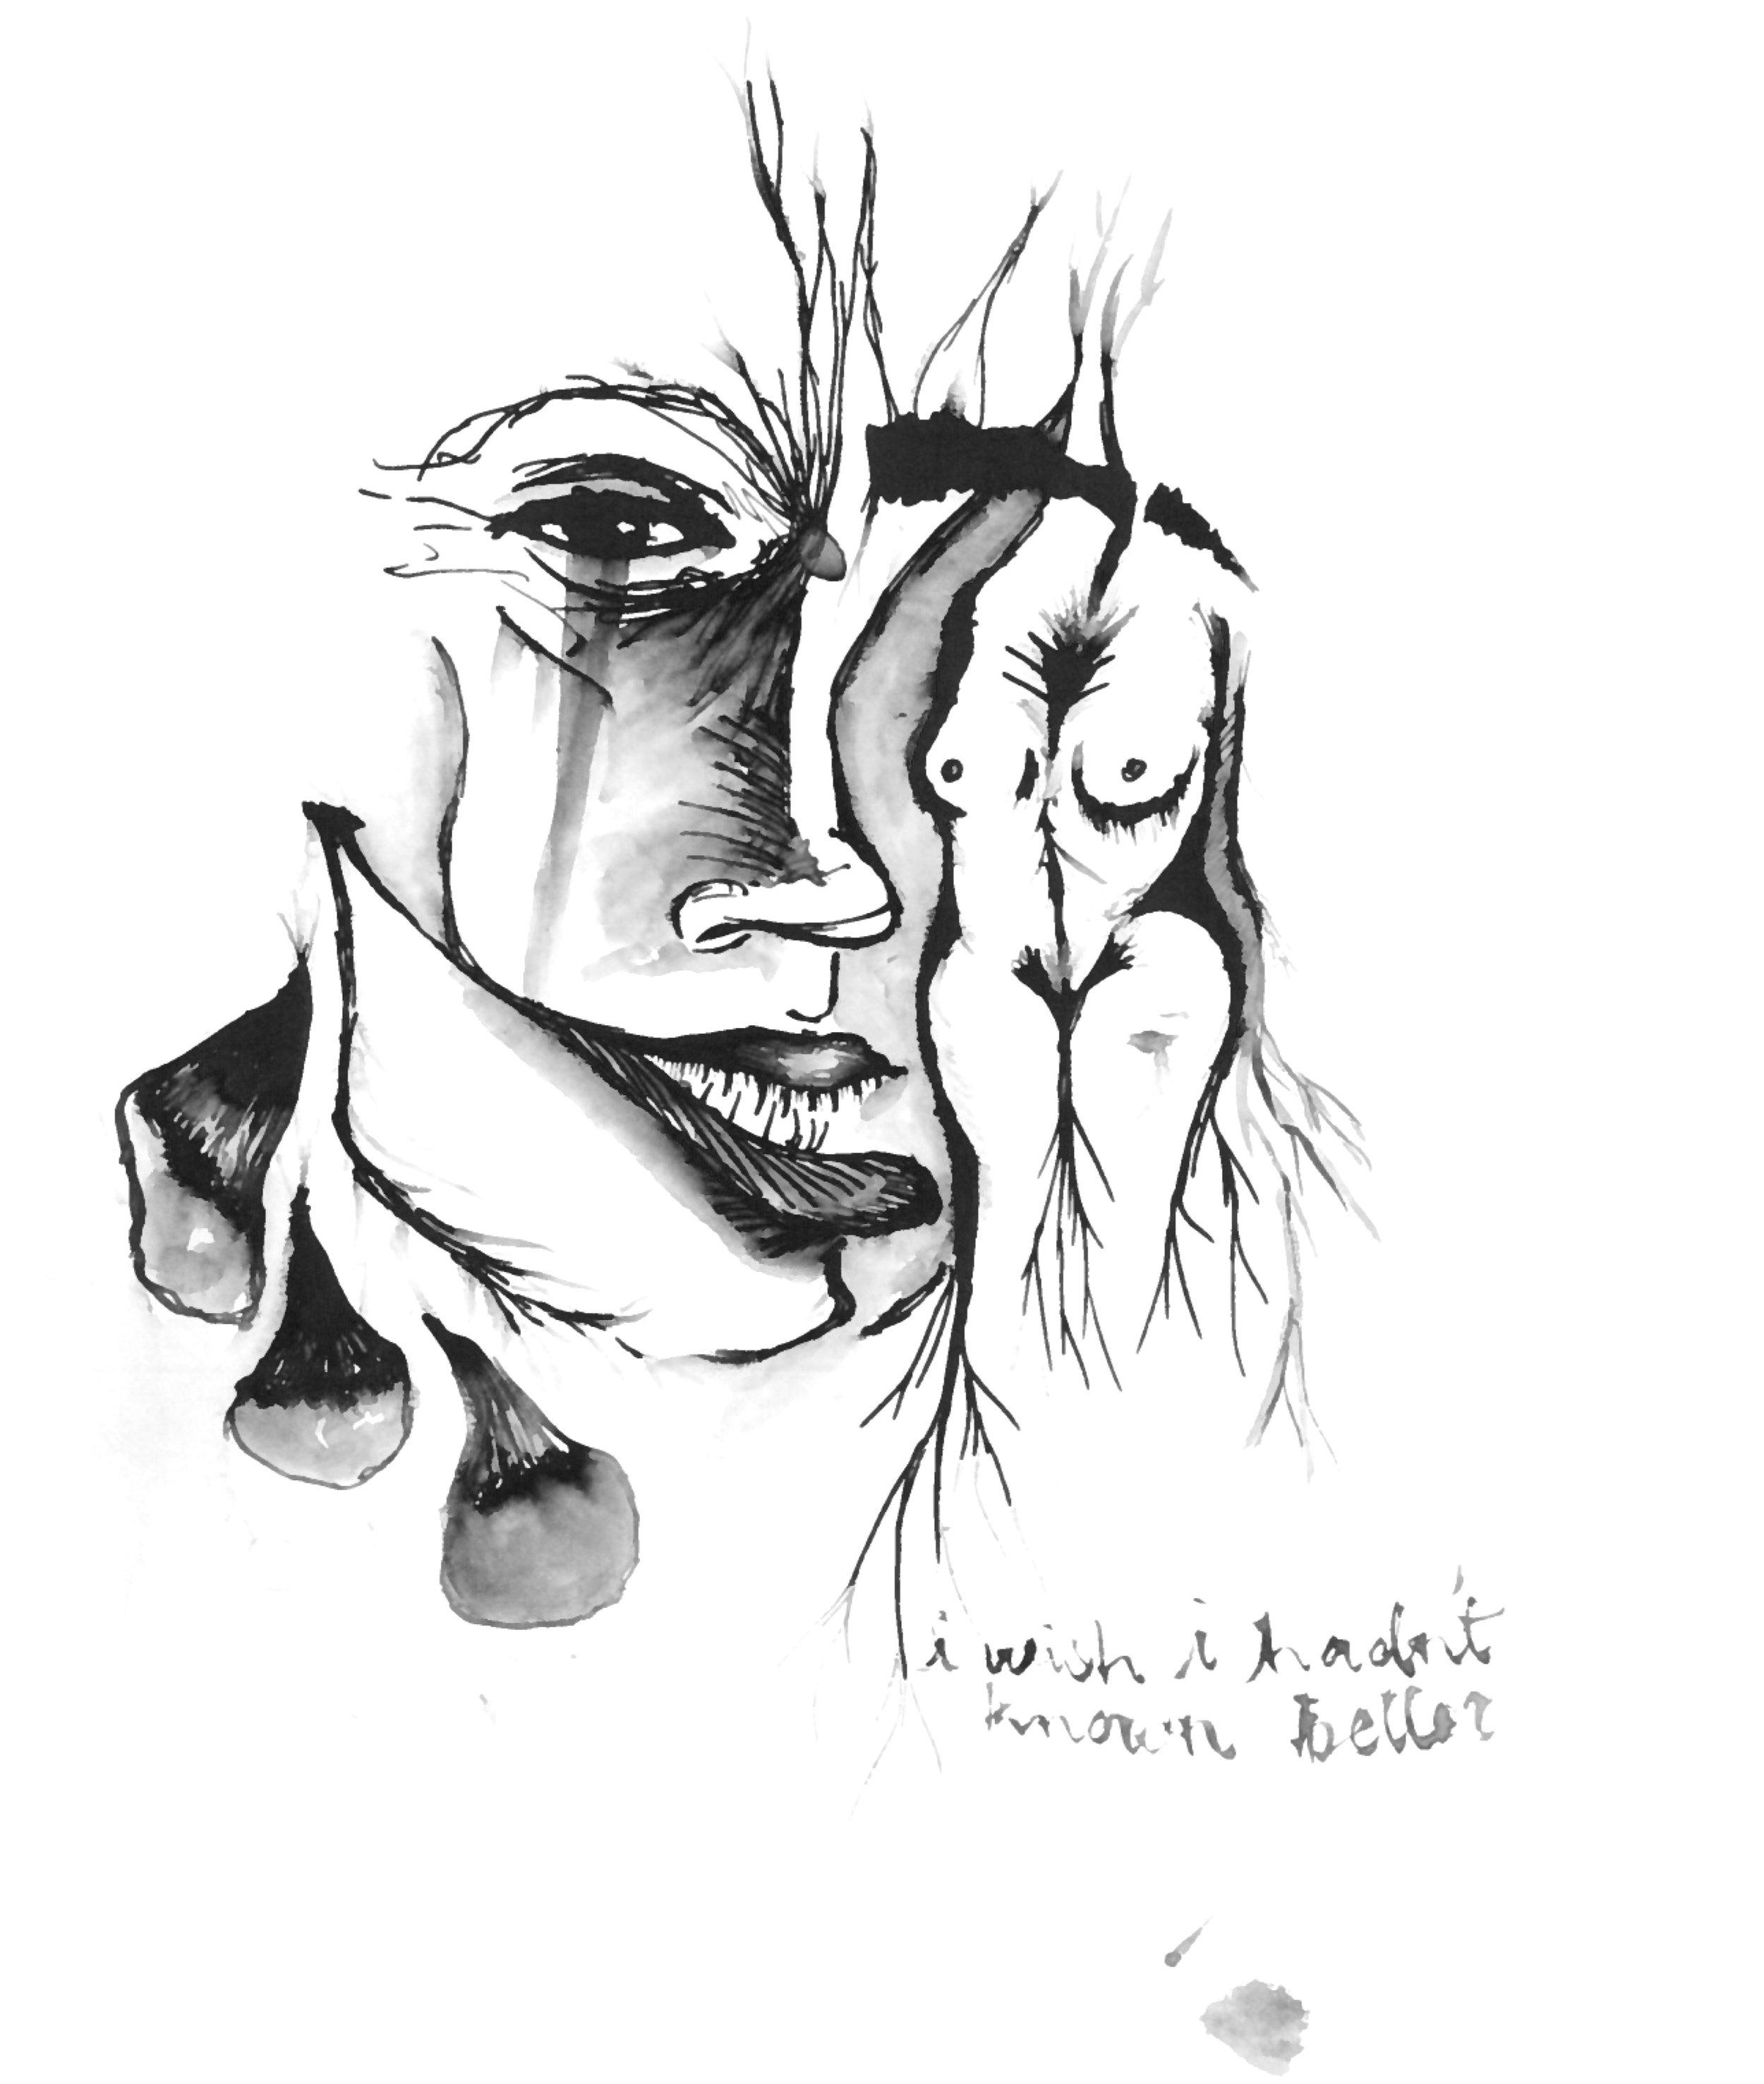 I Wish I Hadn't Known Better , Suki Hyman, Volume VII Issue IV